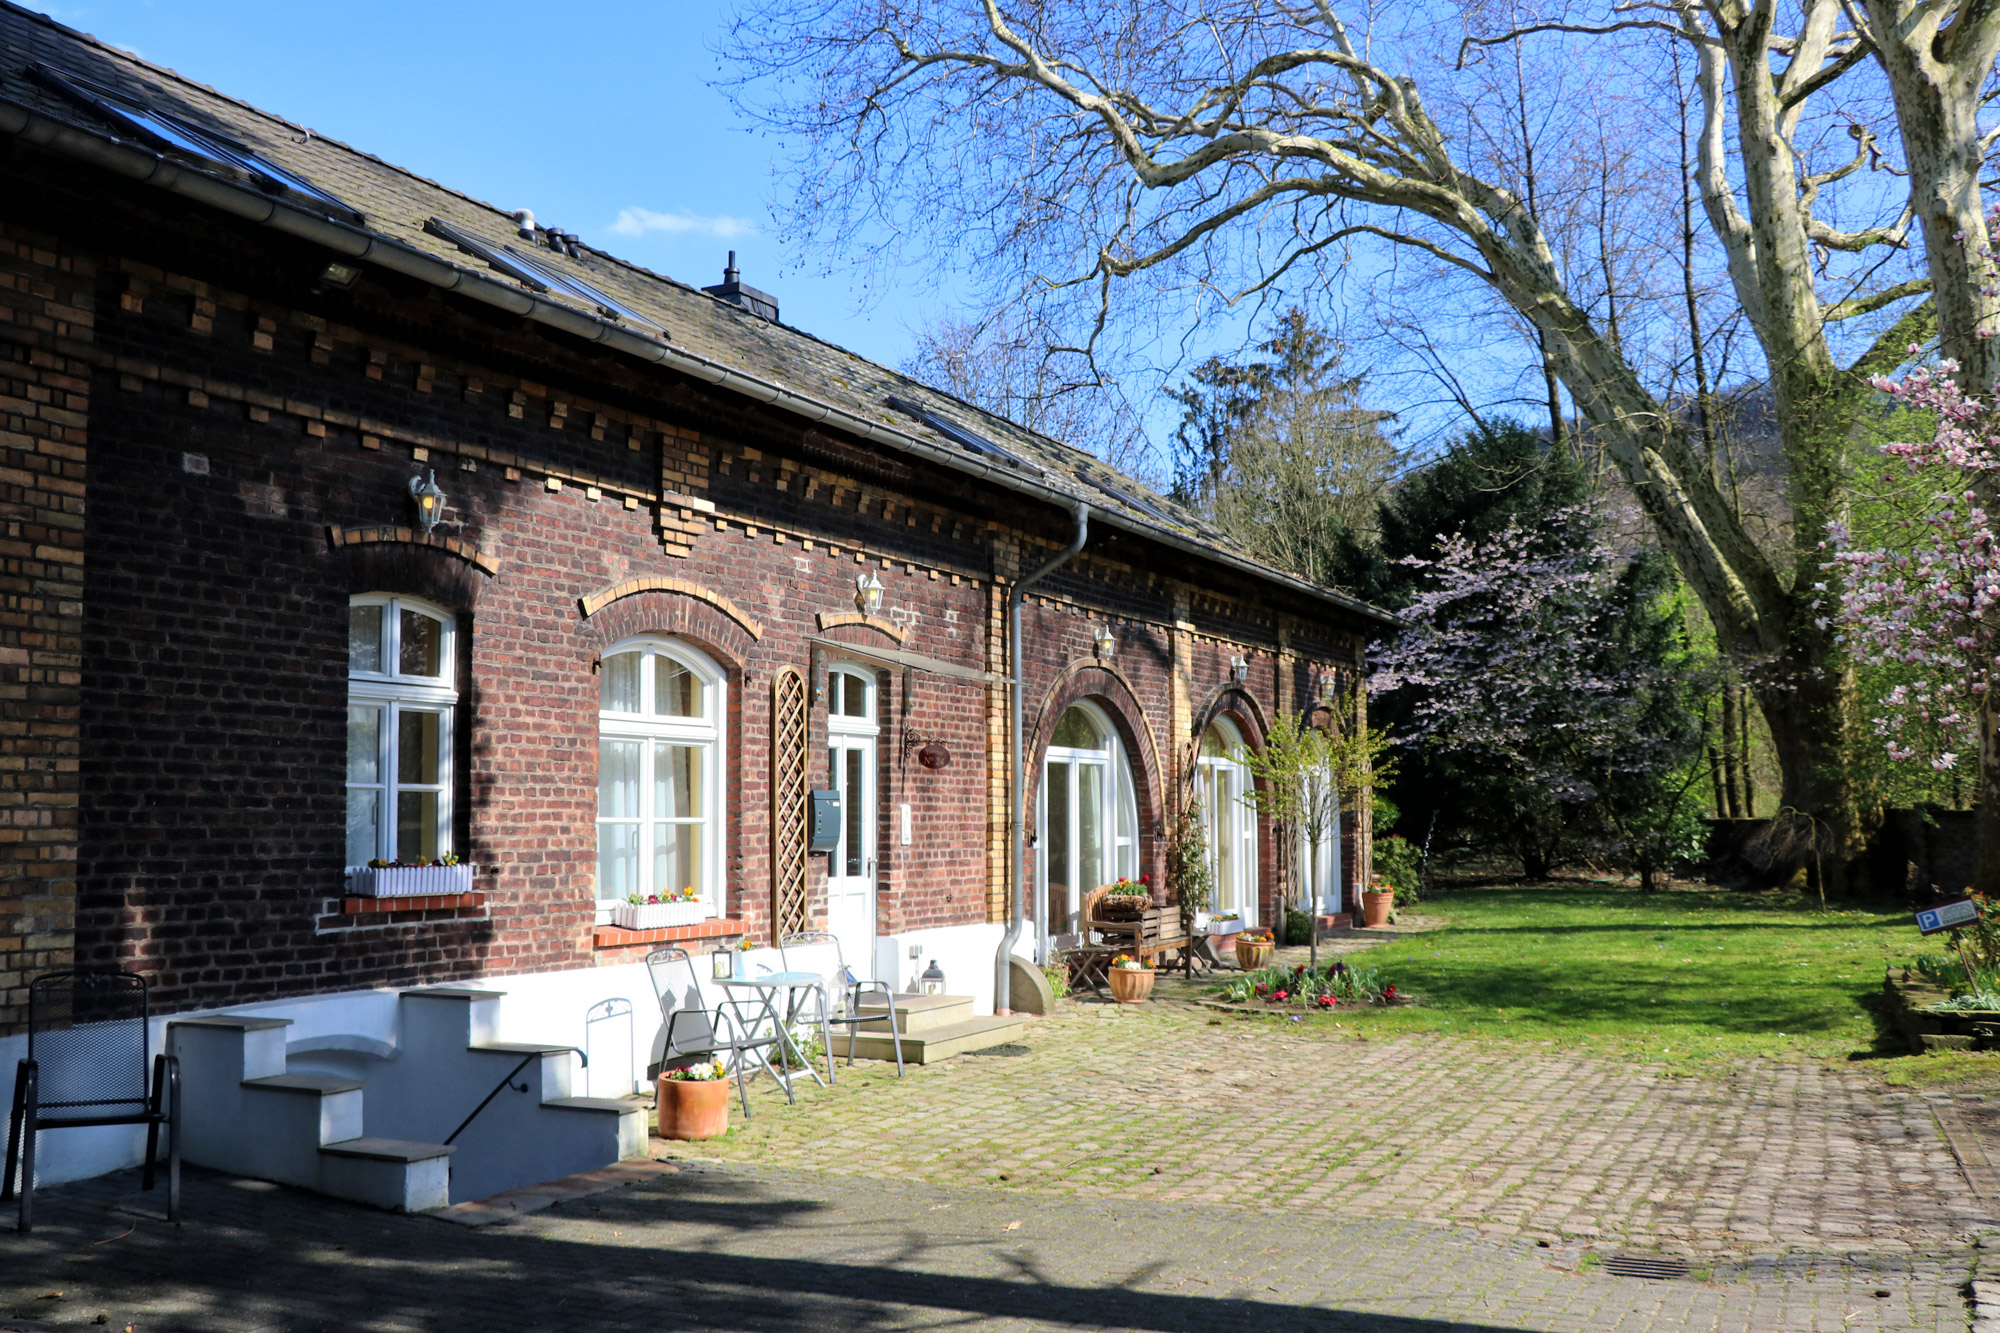 Essen-Kettwig - Villa Karrenberg